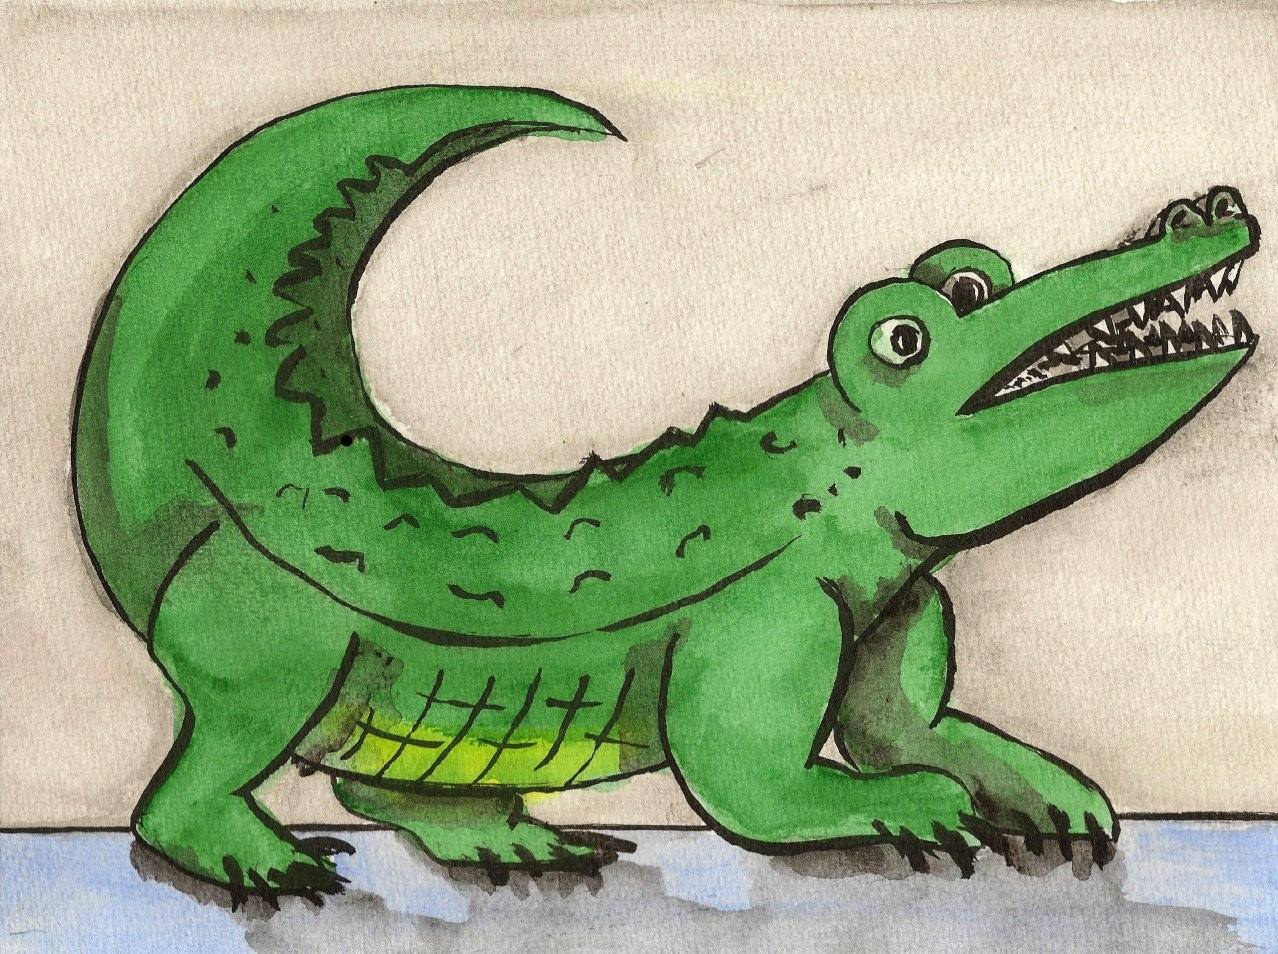 Cliparts gratuits crocodile dessin d 39 un crocodile la queue montante - Dessin anime de crocodile ...